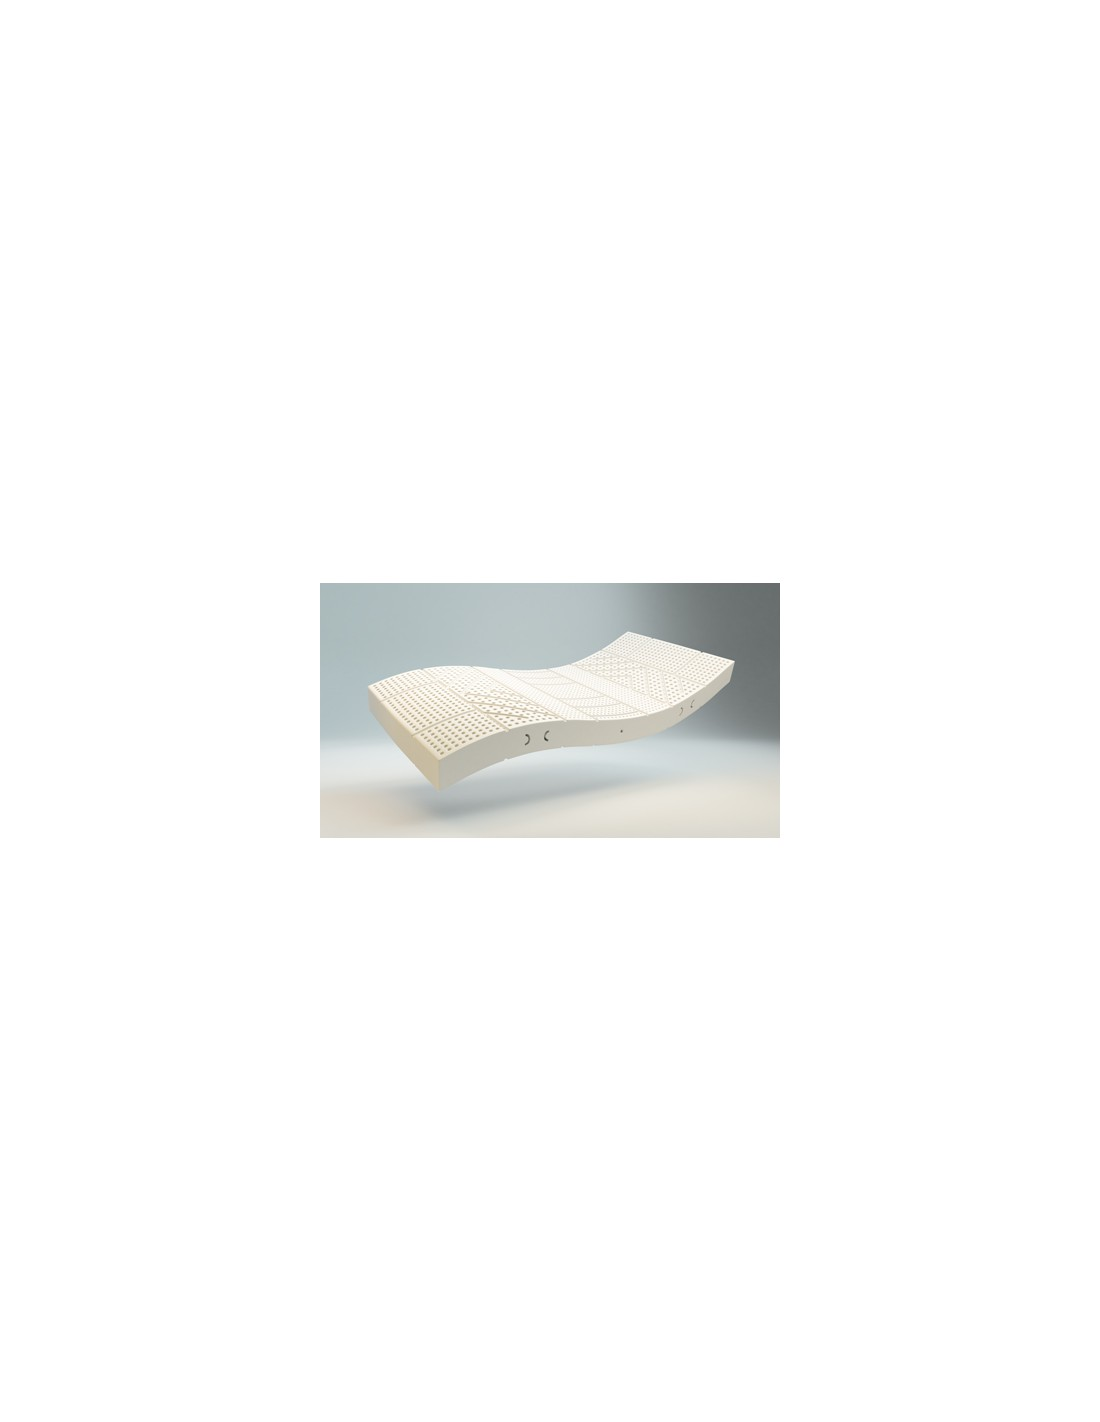 matelas latex naturel 70x190 bio haut de gamme ferme 21 cm. Black Bedroom Furniture Sets. Home Design Ideas